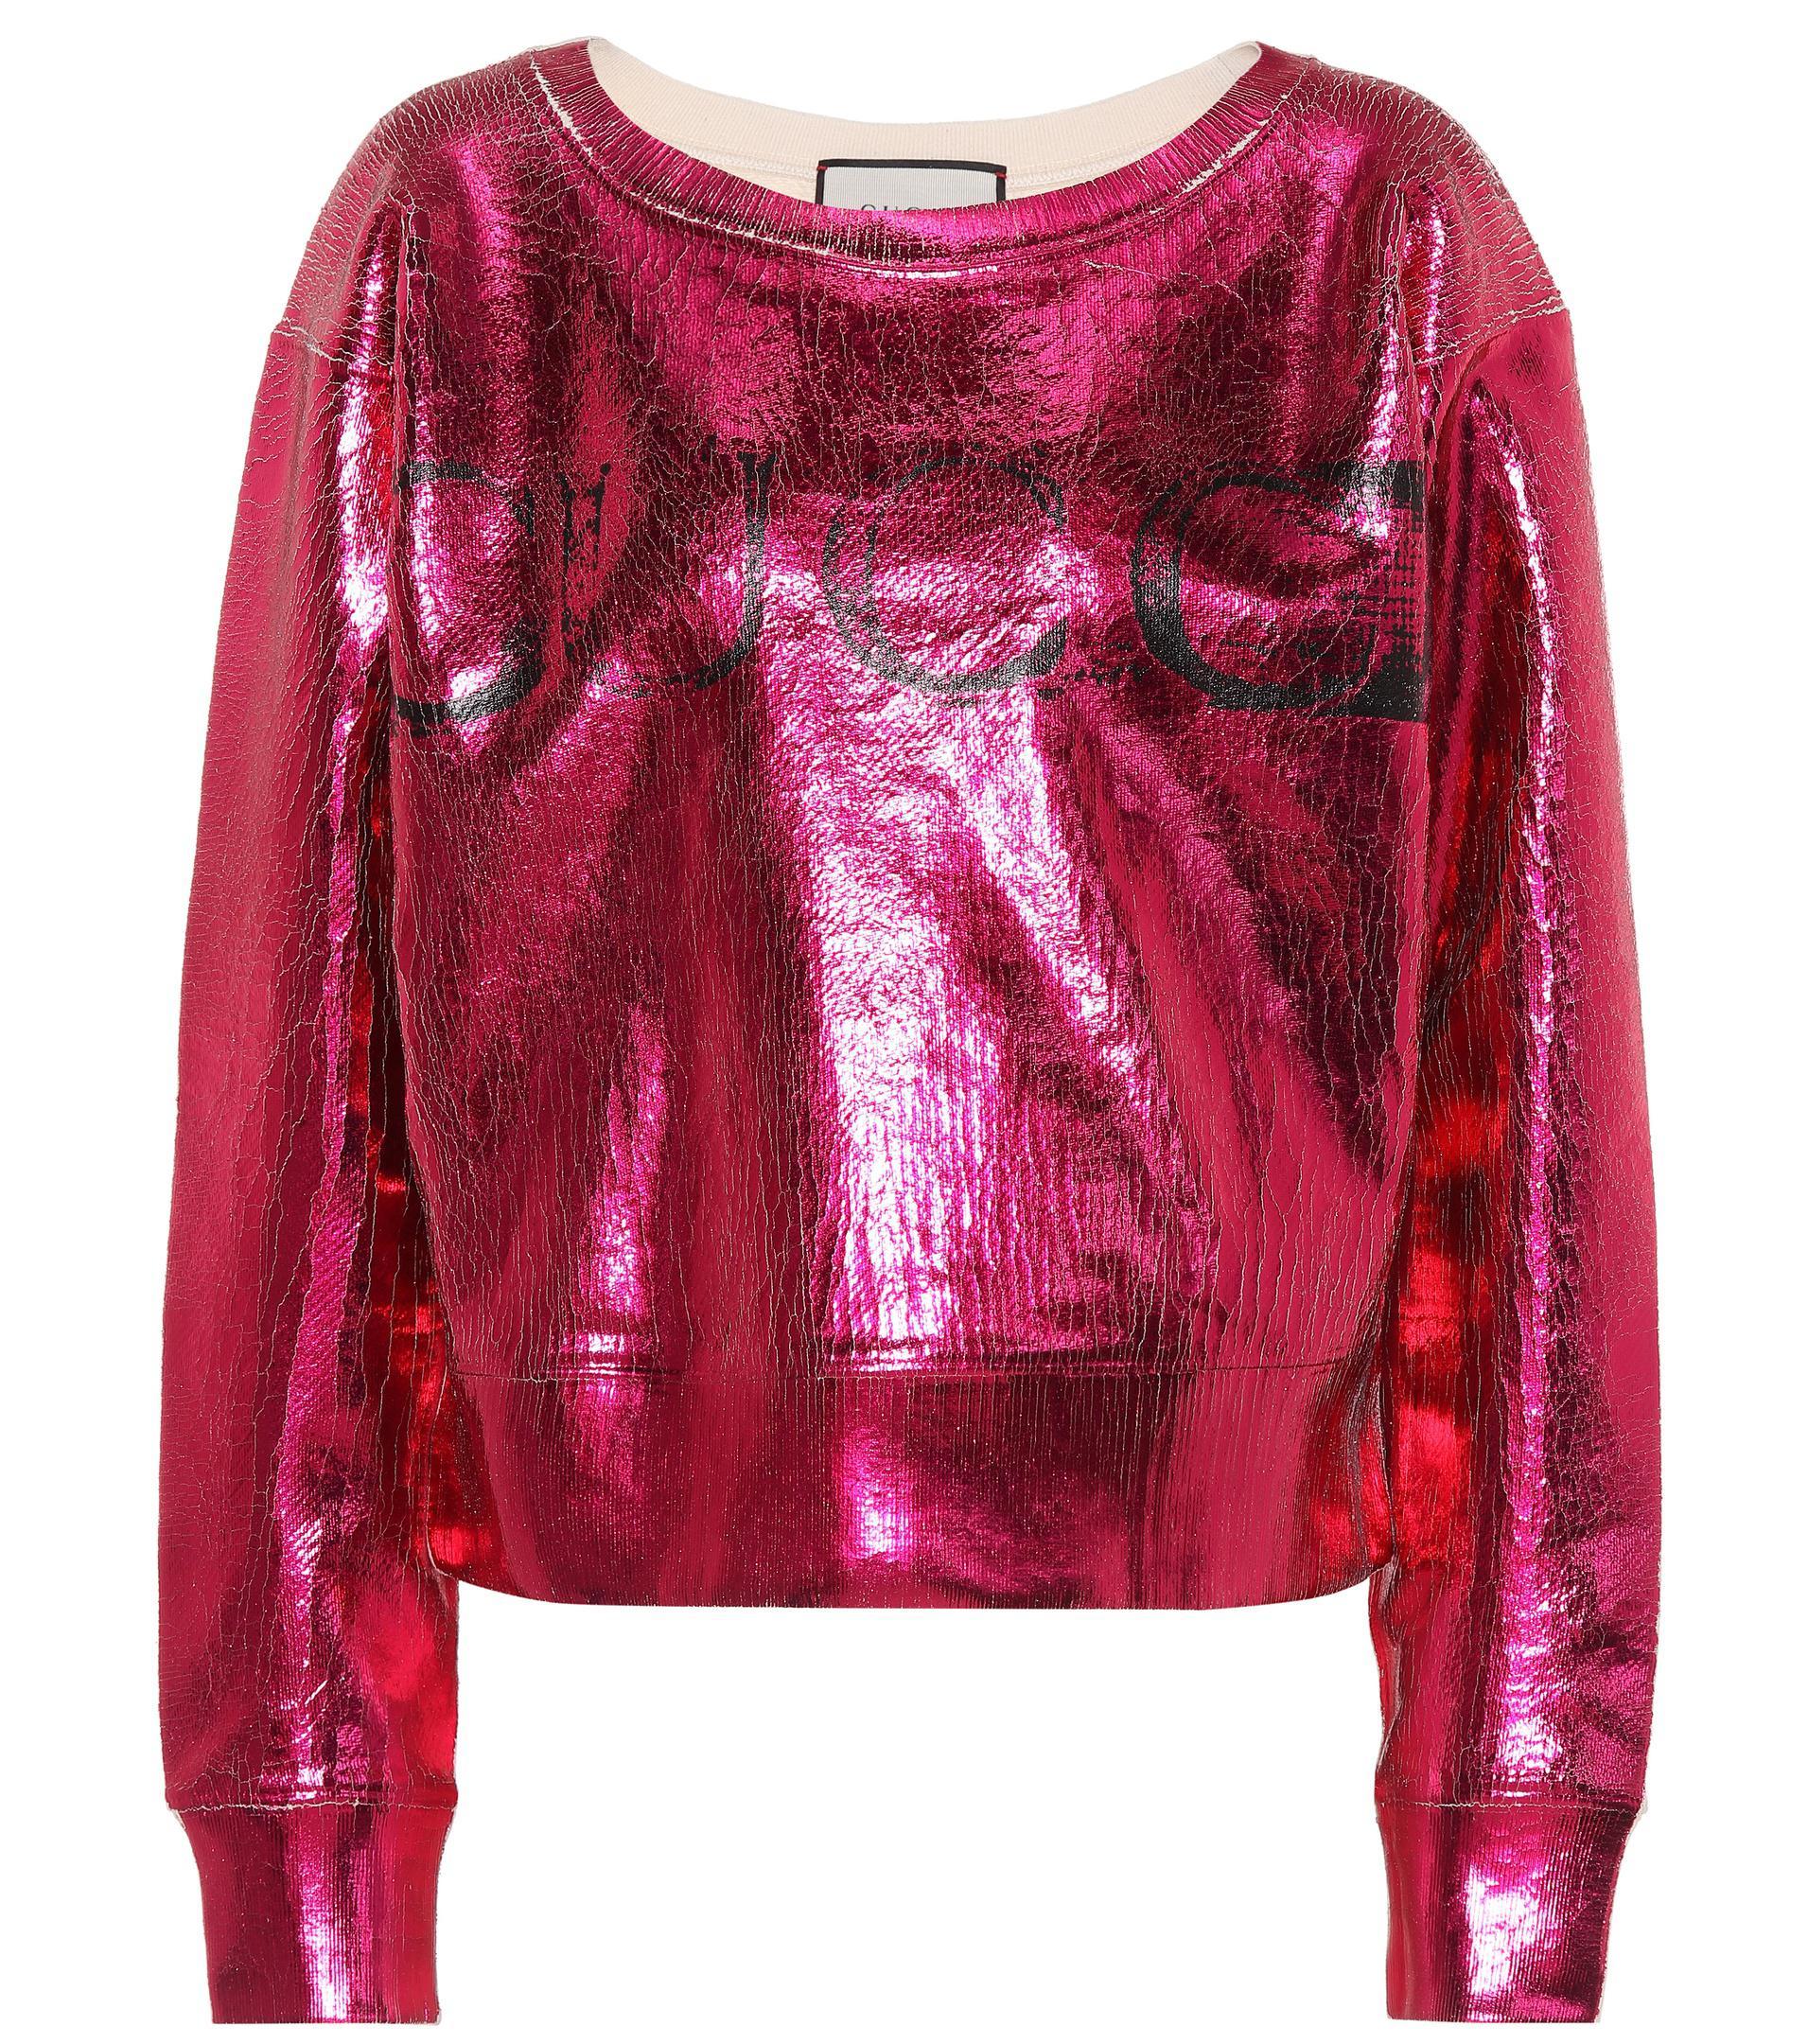 Gucci Metallic Cotton Sweatshirt in Pink - Lyst